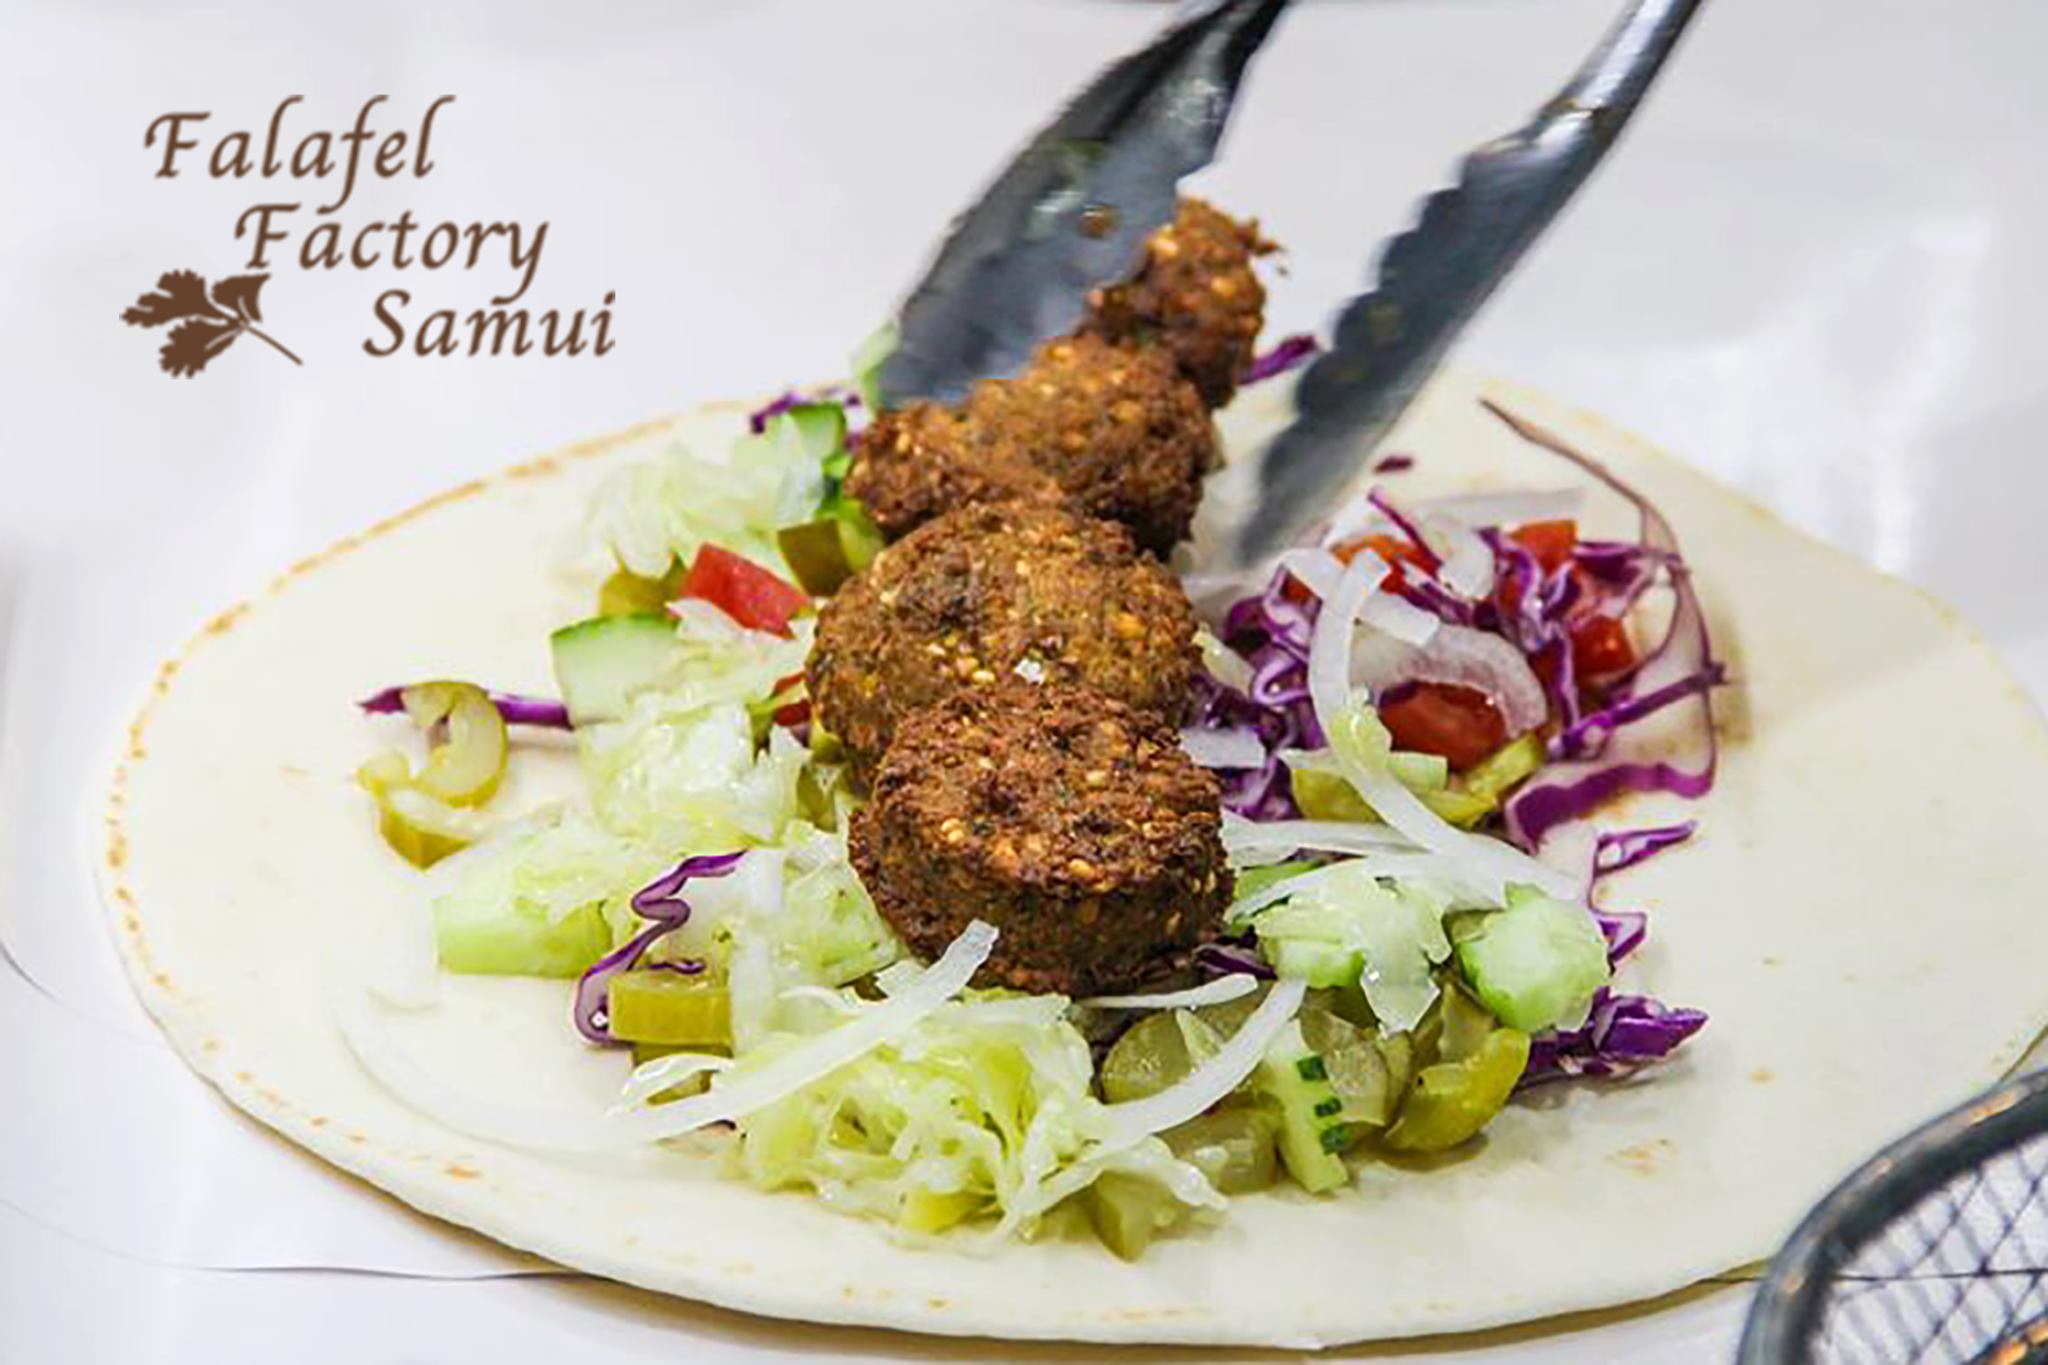 Falafel Factory Samui